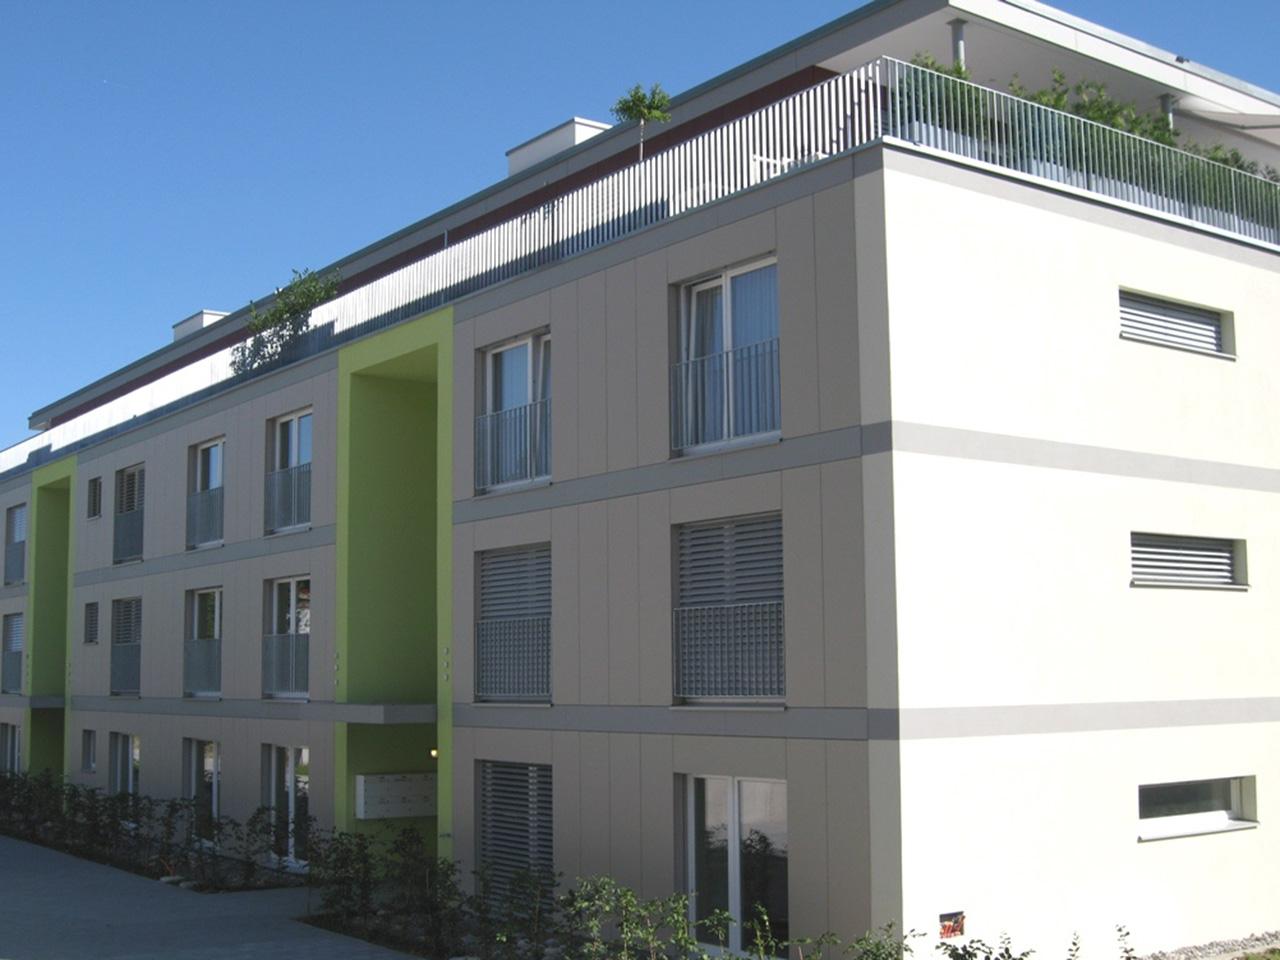 laubhus-immobilienverkauf-chunten-doettingen-weinkeller